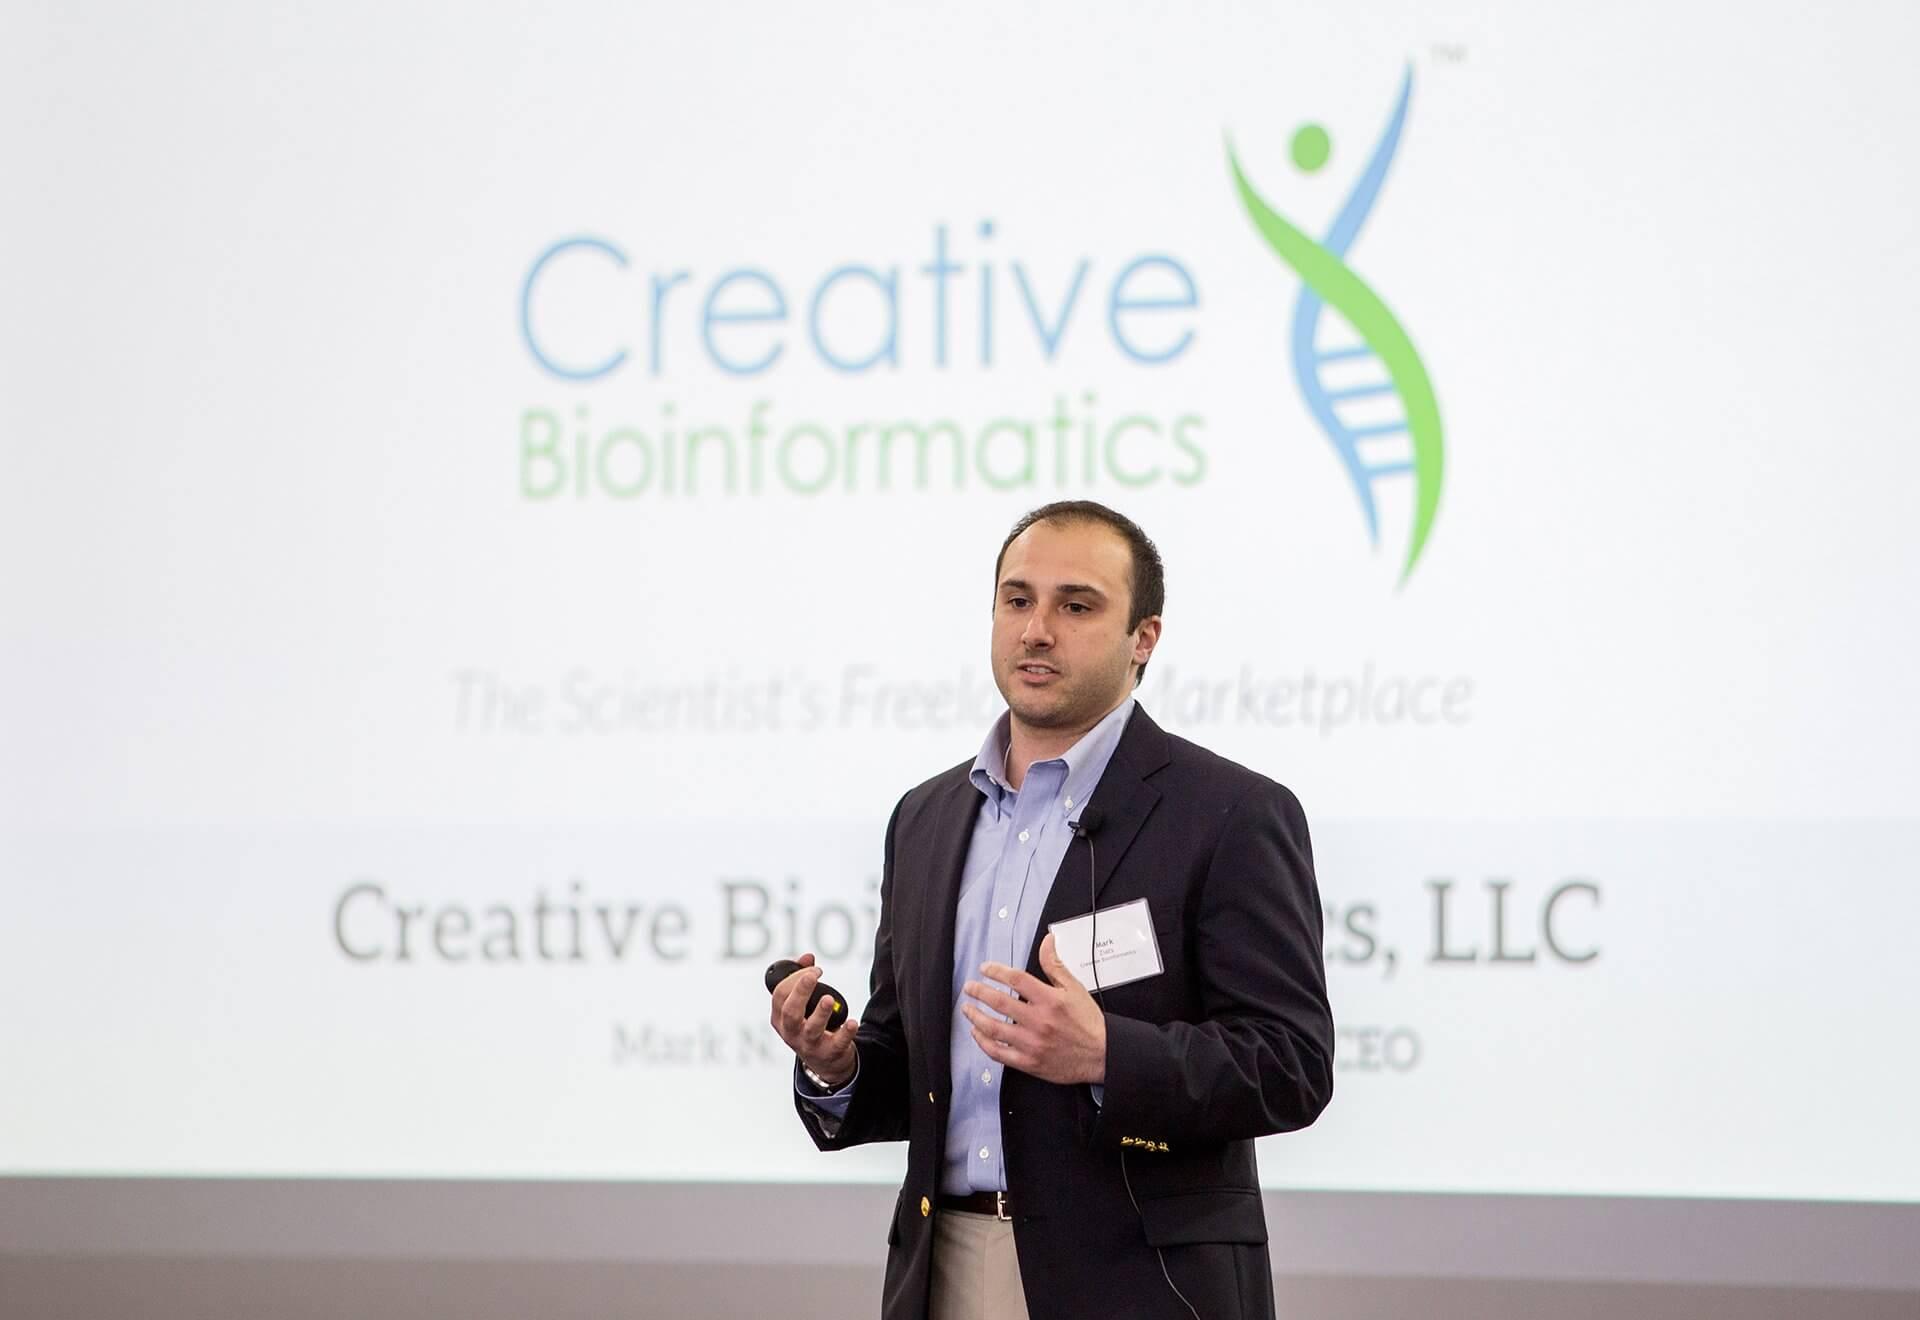 Mark Ziats, Ph.D., president of Creative Bioinformatics